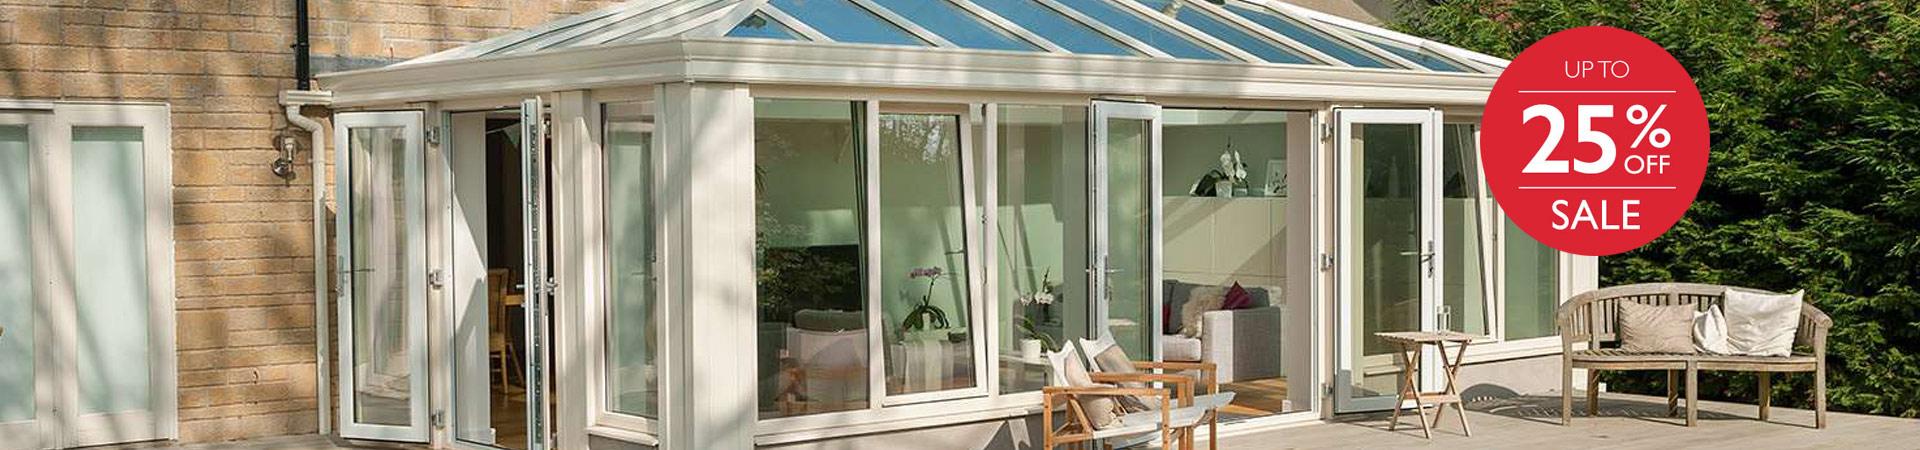 Conservatories concept windows and conservatories essex - Conservatories Concept Windows And Conservatories Essex 15